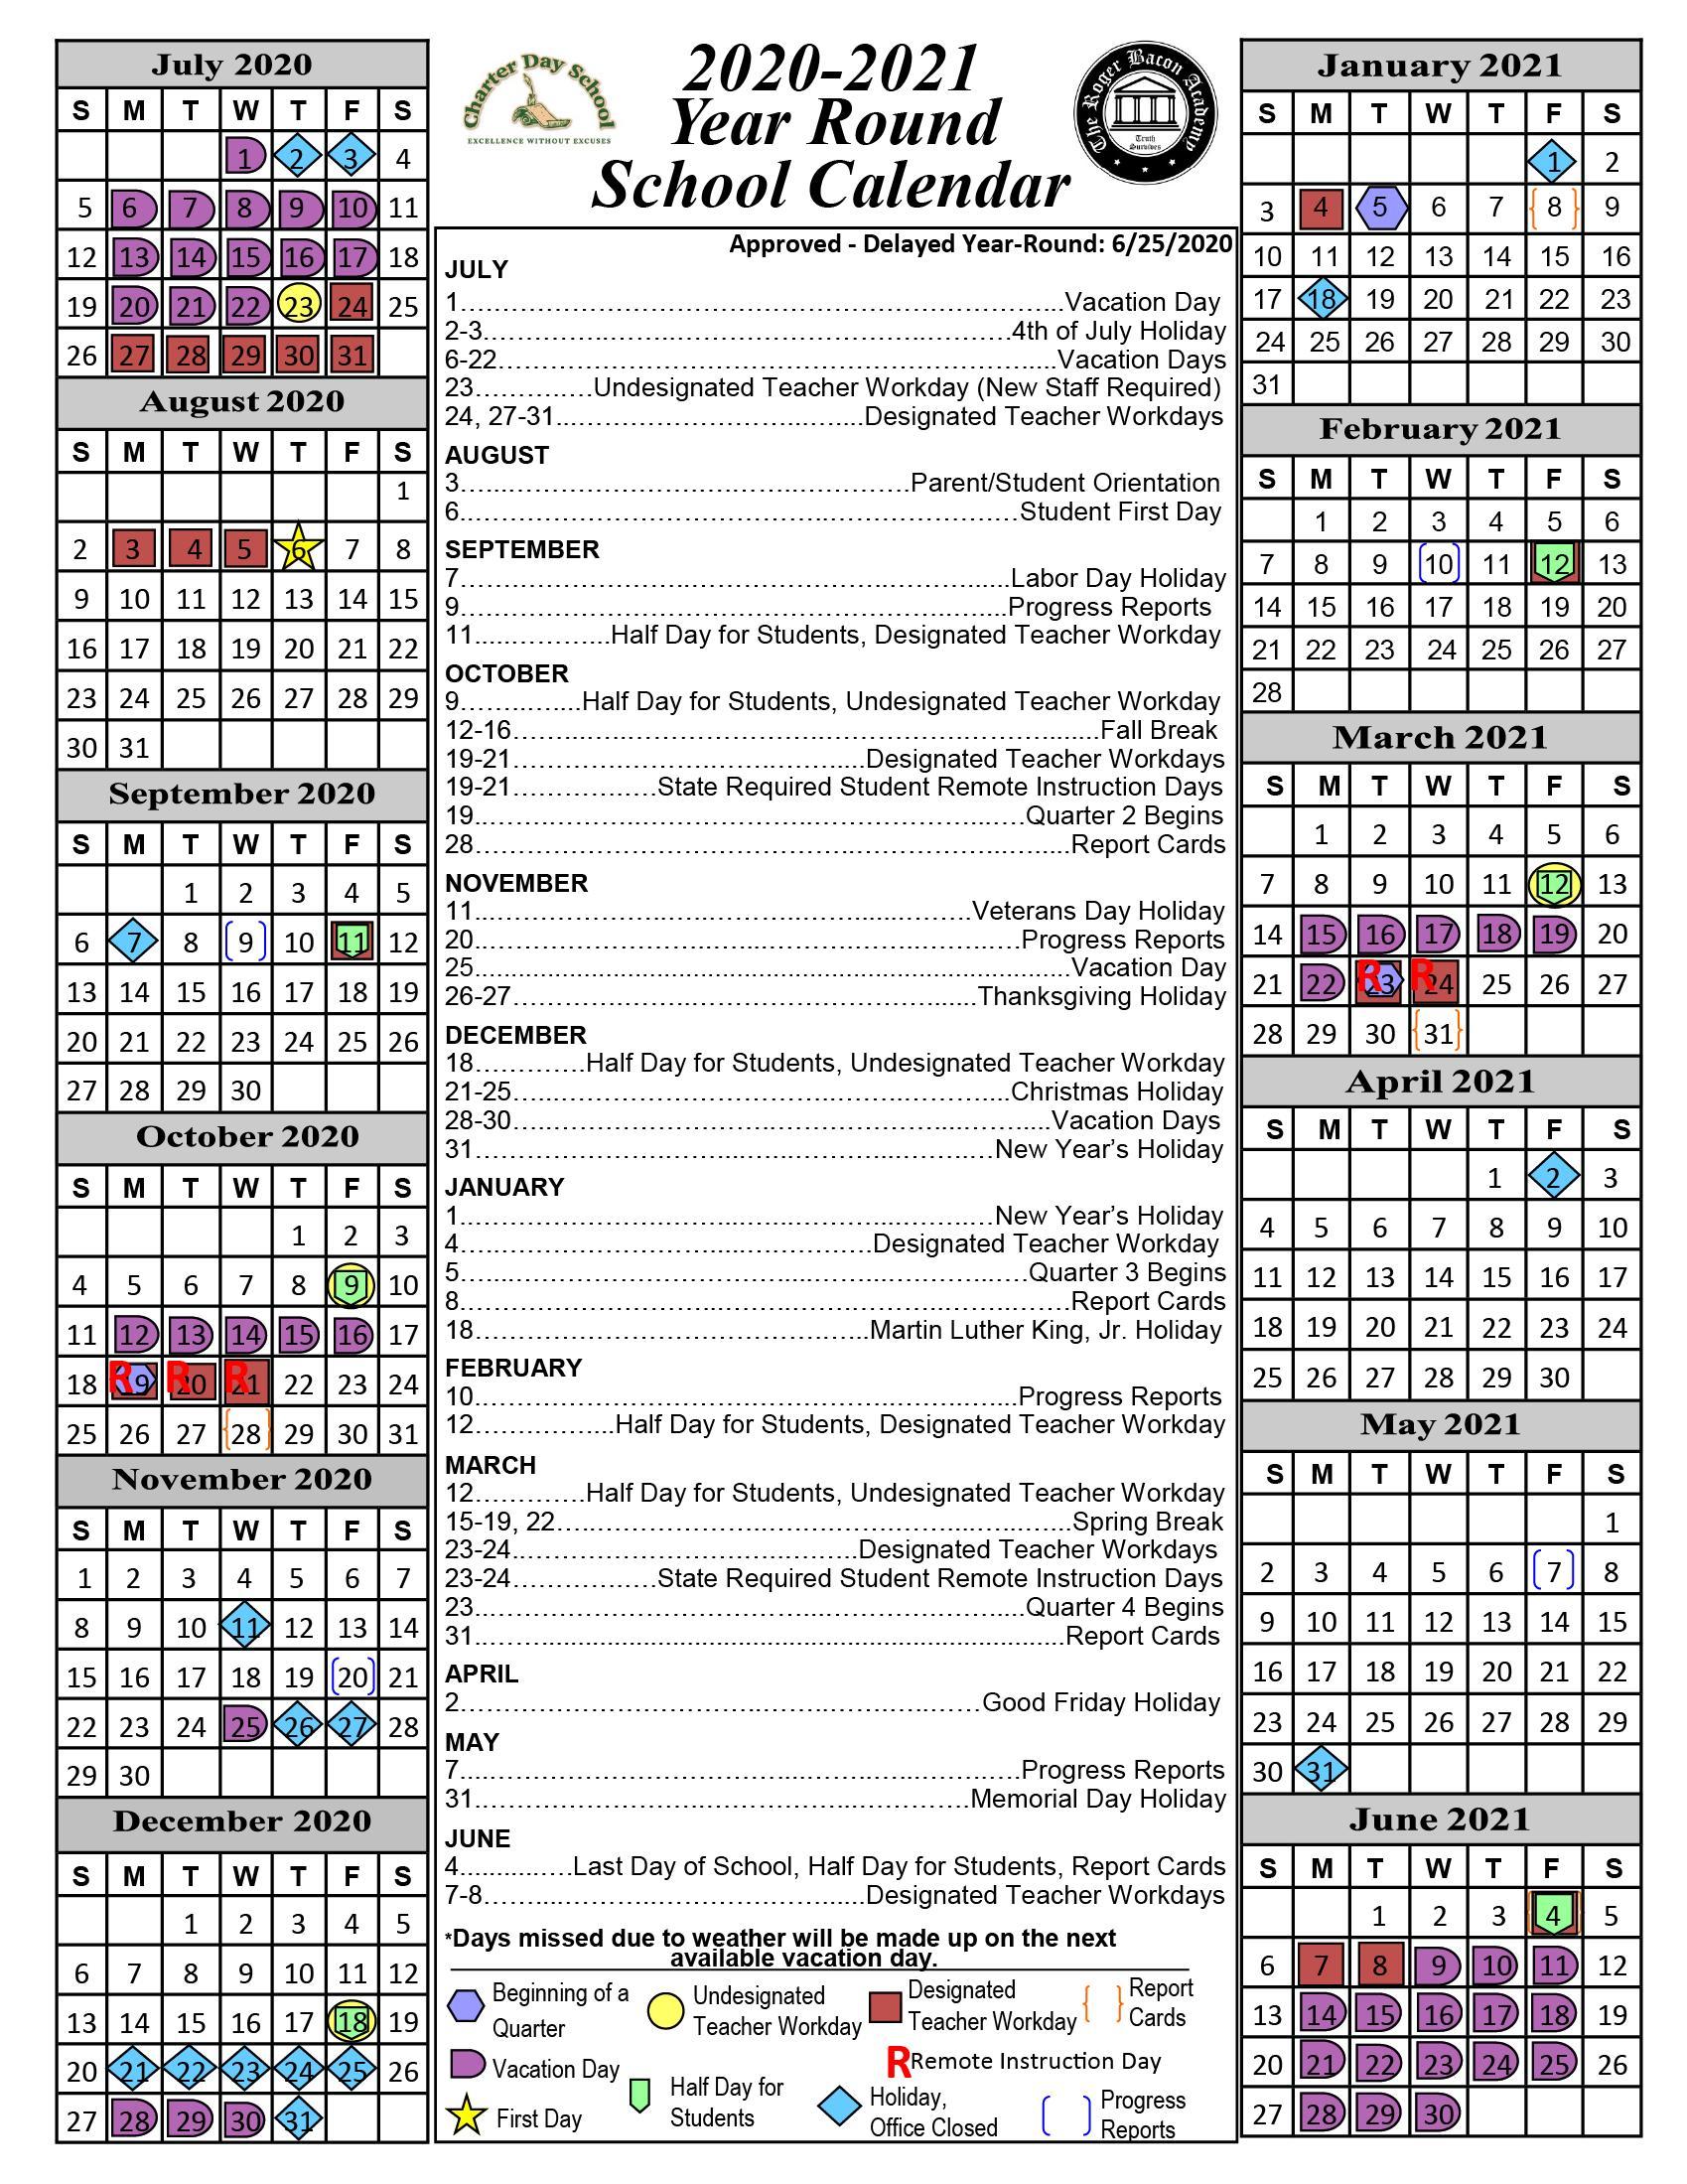 Unc Academic Calendar 2021-2022 Calendar « Charter Day School